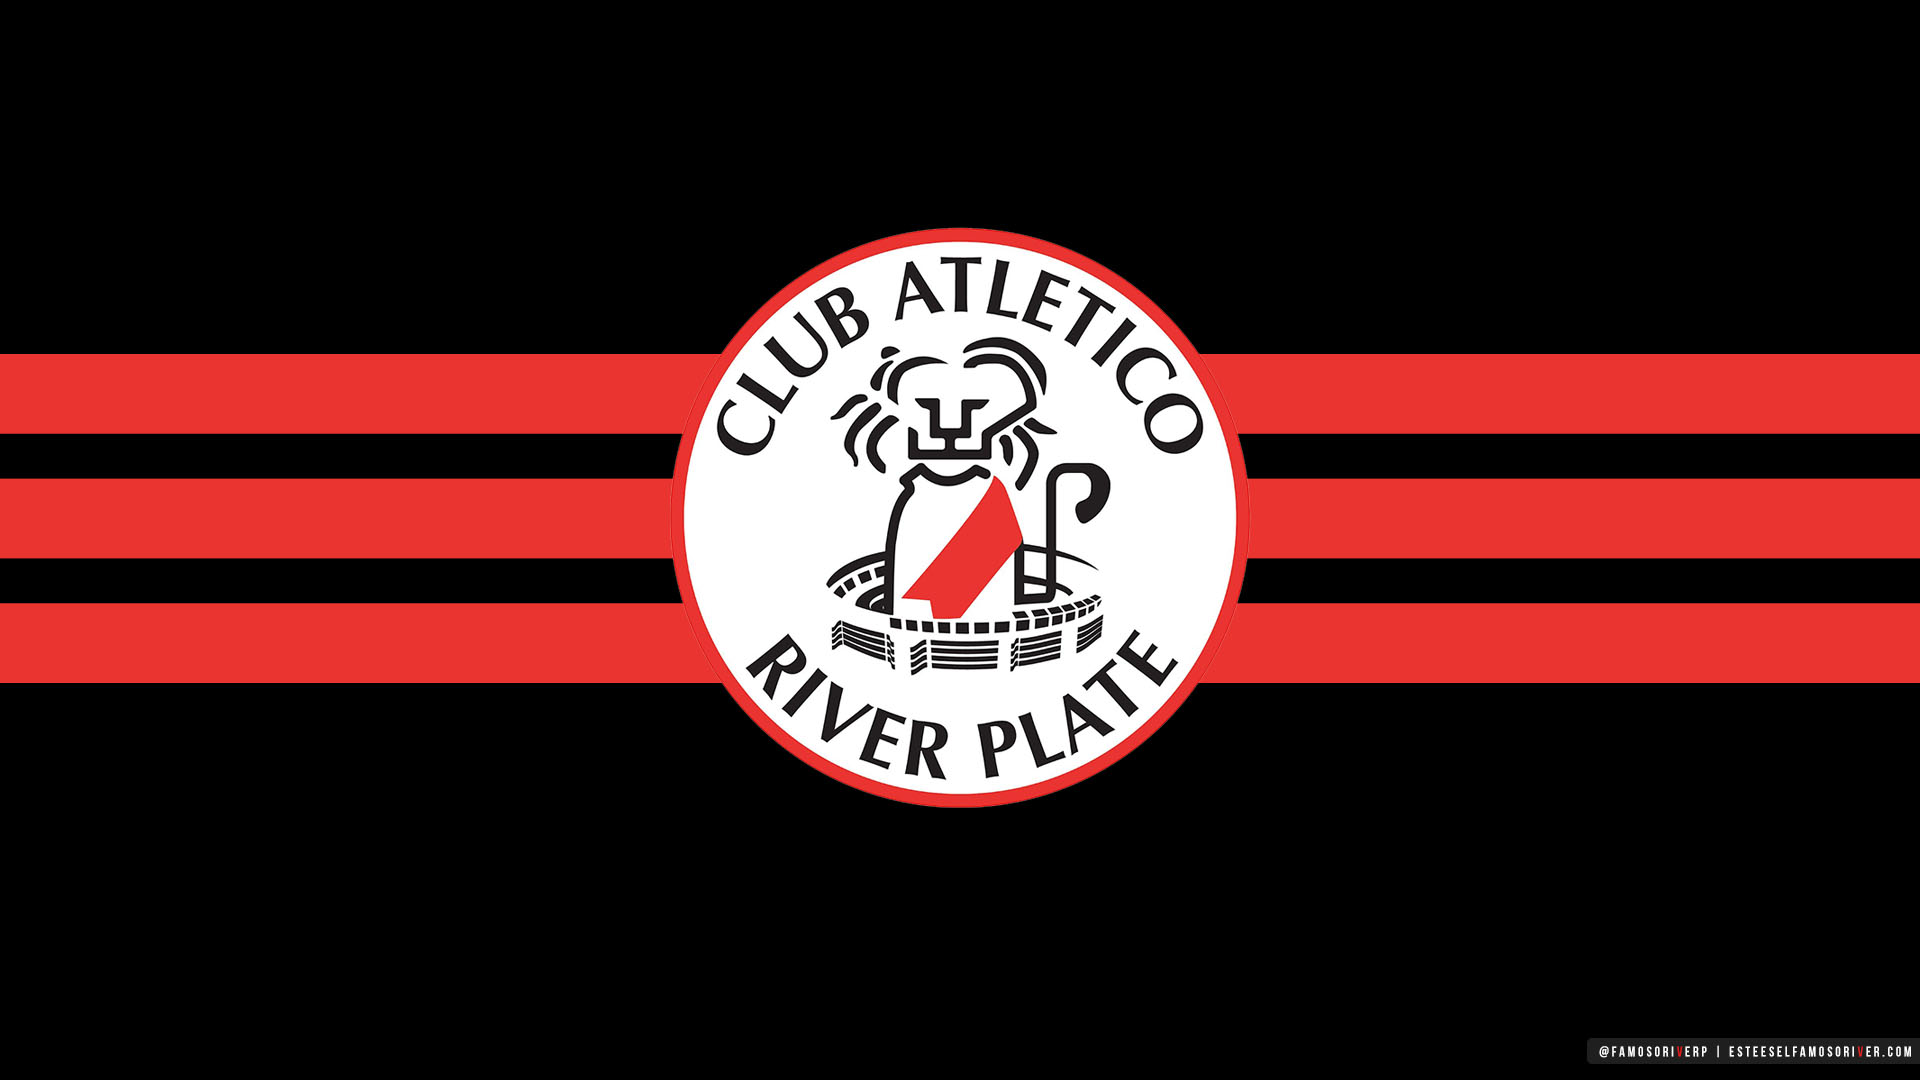 imagenes-de-River-Plate-para-fondos-de-pantalla-wallpaper-de-River-Escudo River Plate - León Vintage - Años 80 - Década del 80 - Caloi - Fondo Negro